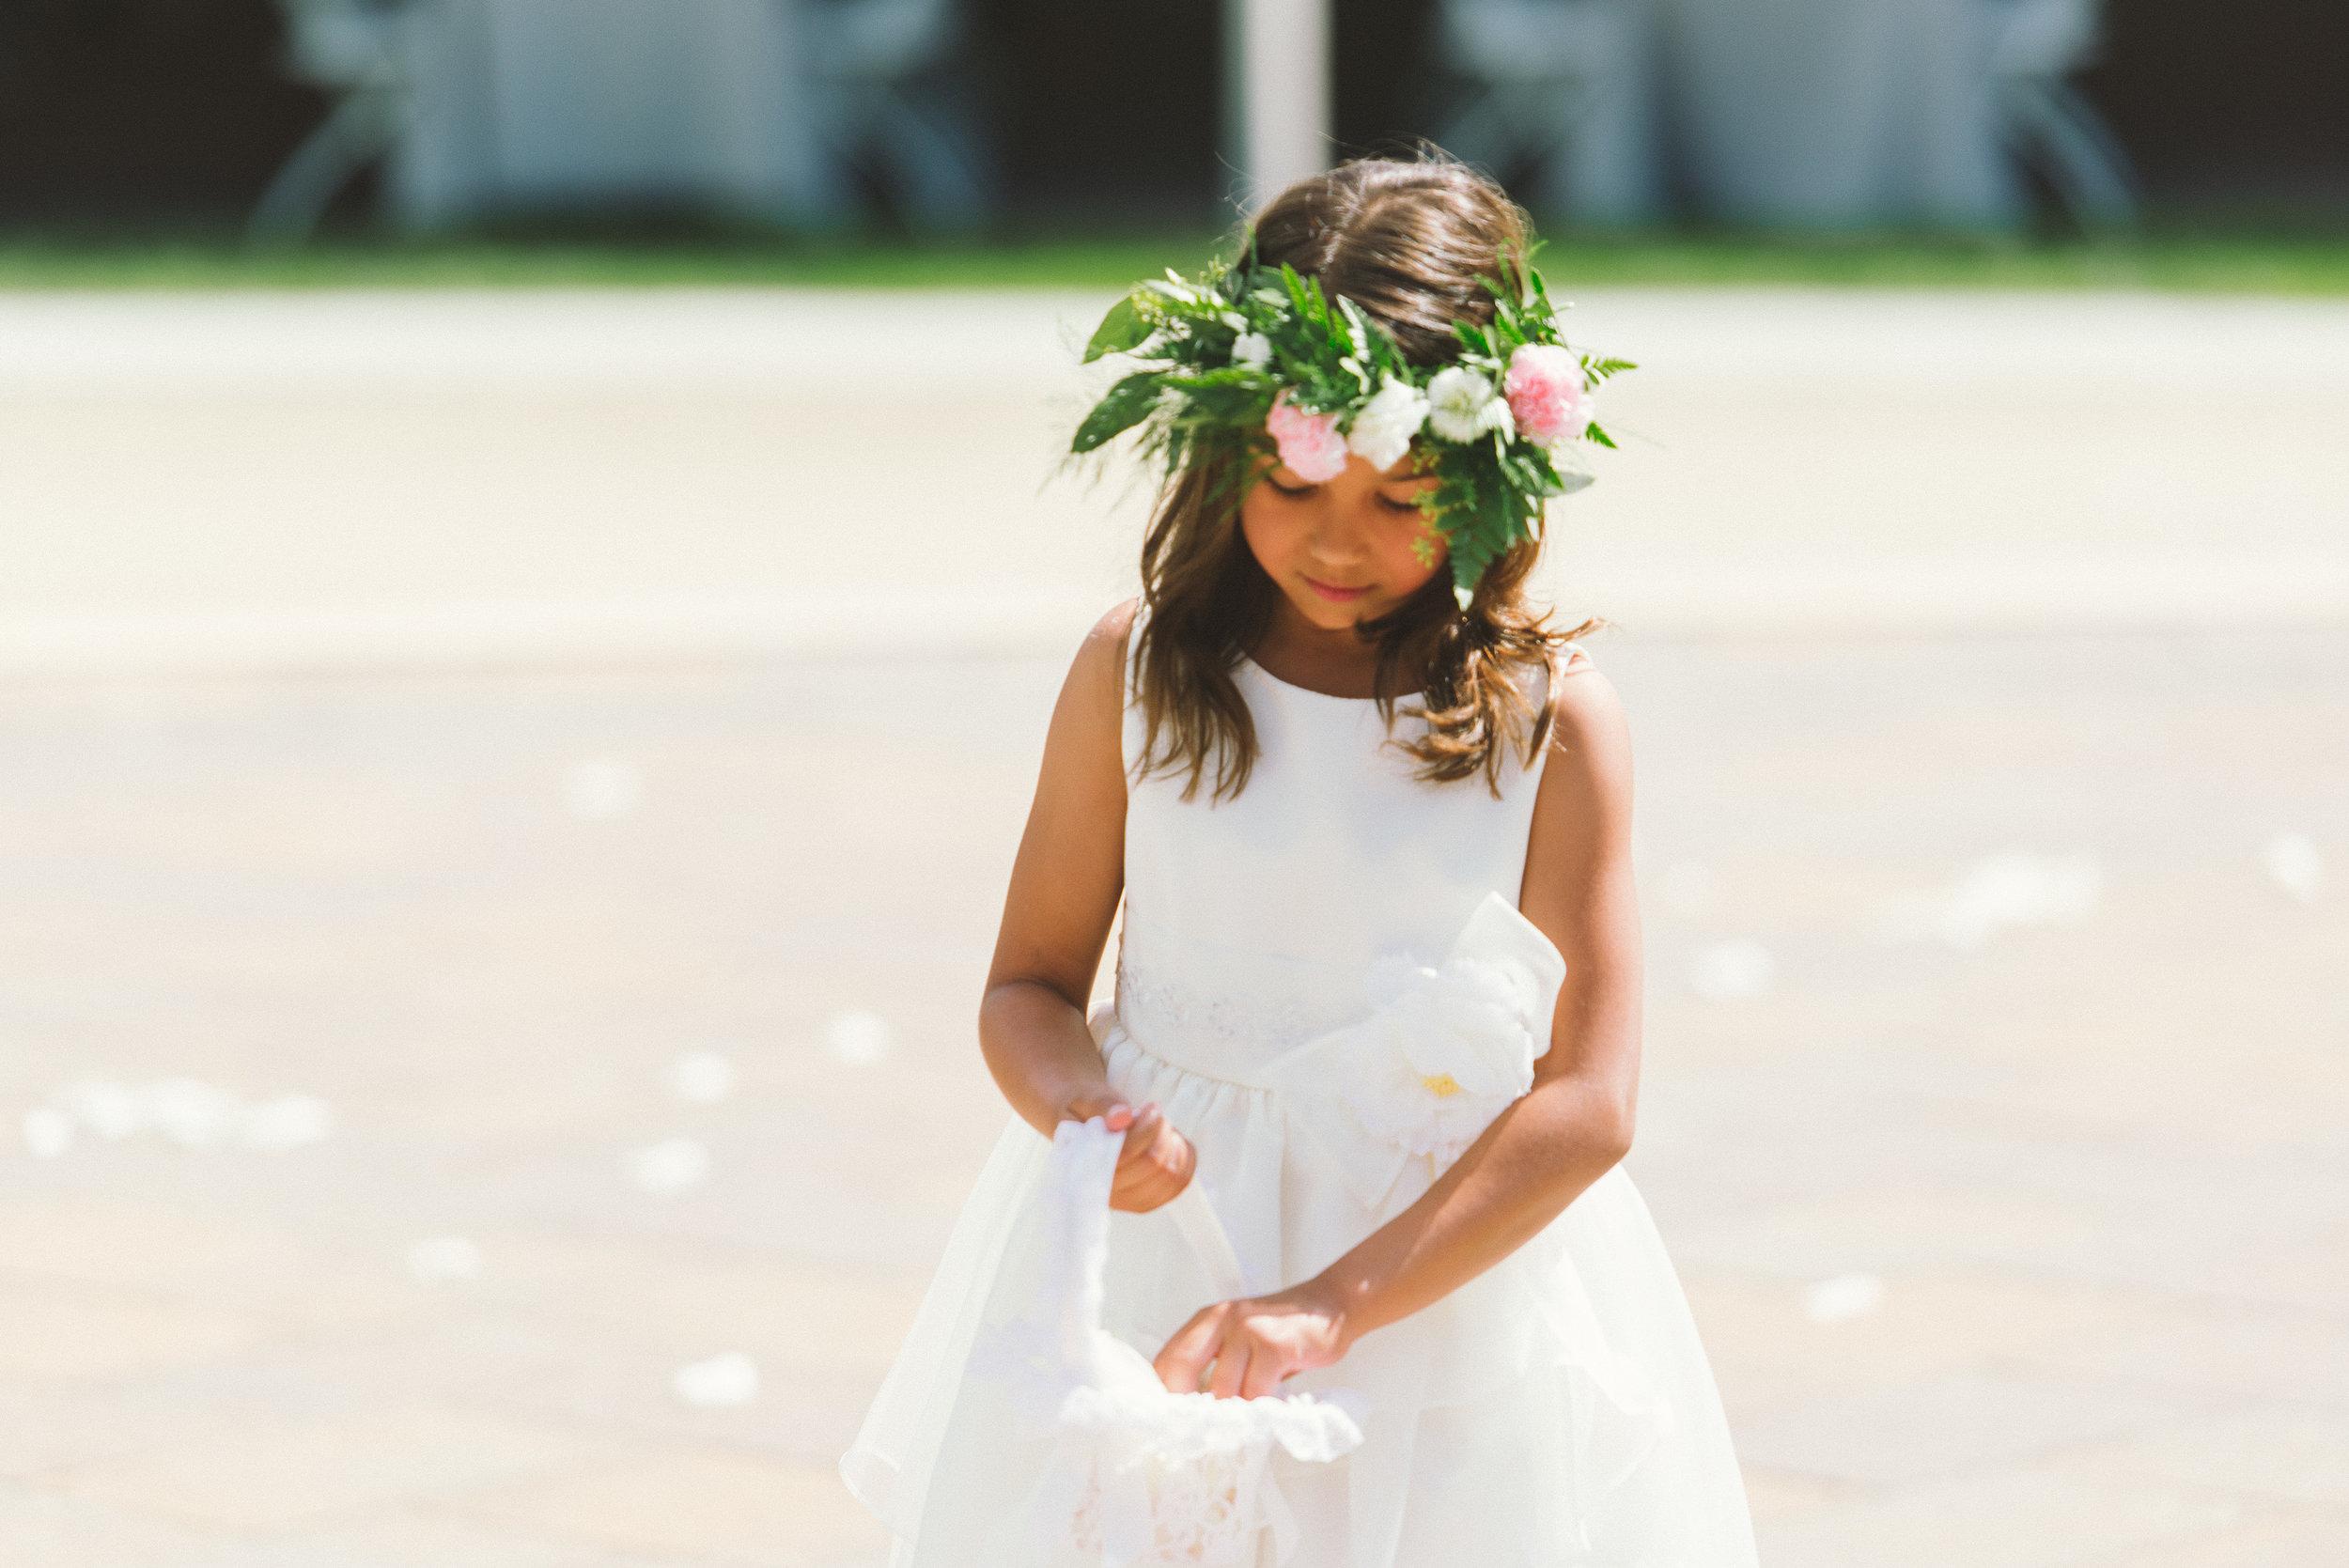 Cute flower girl with flower crown